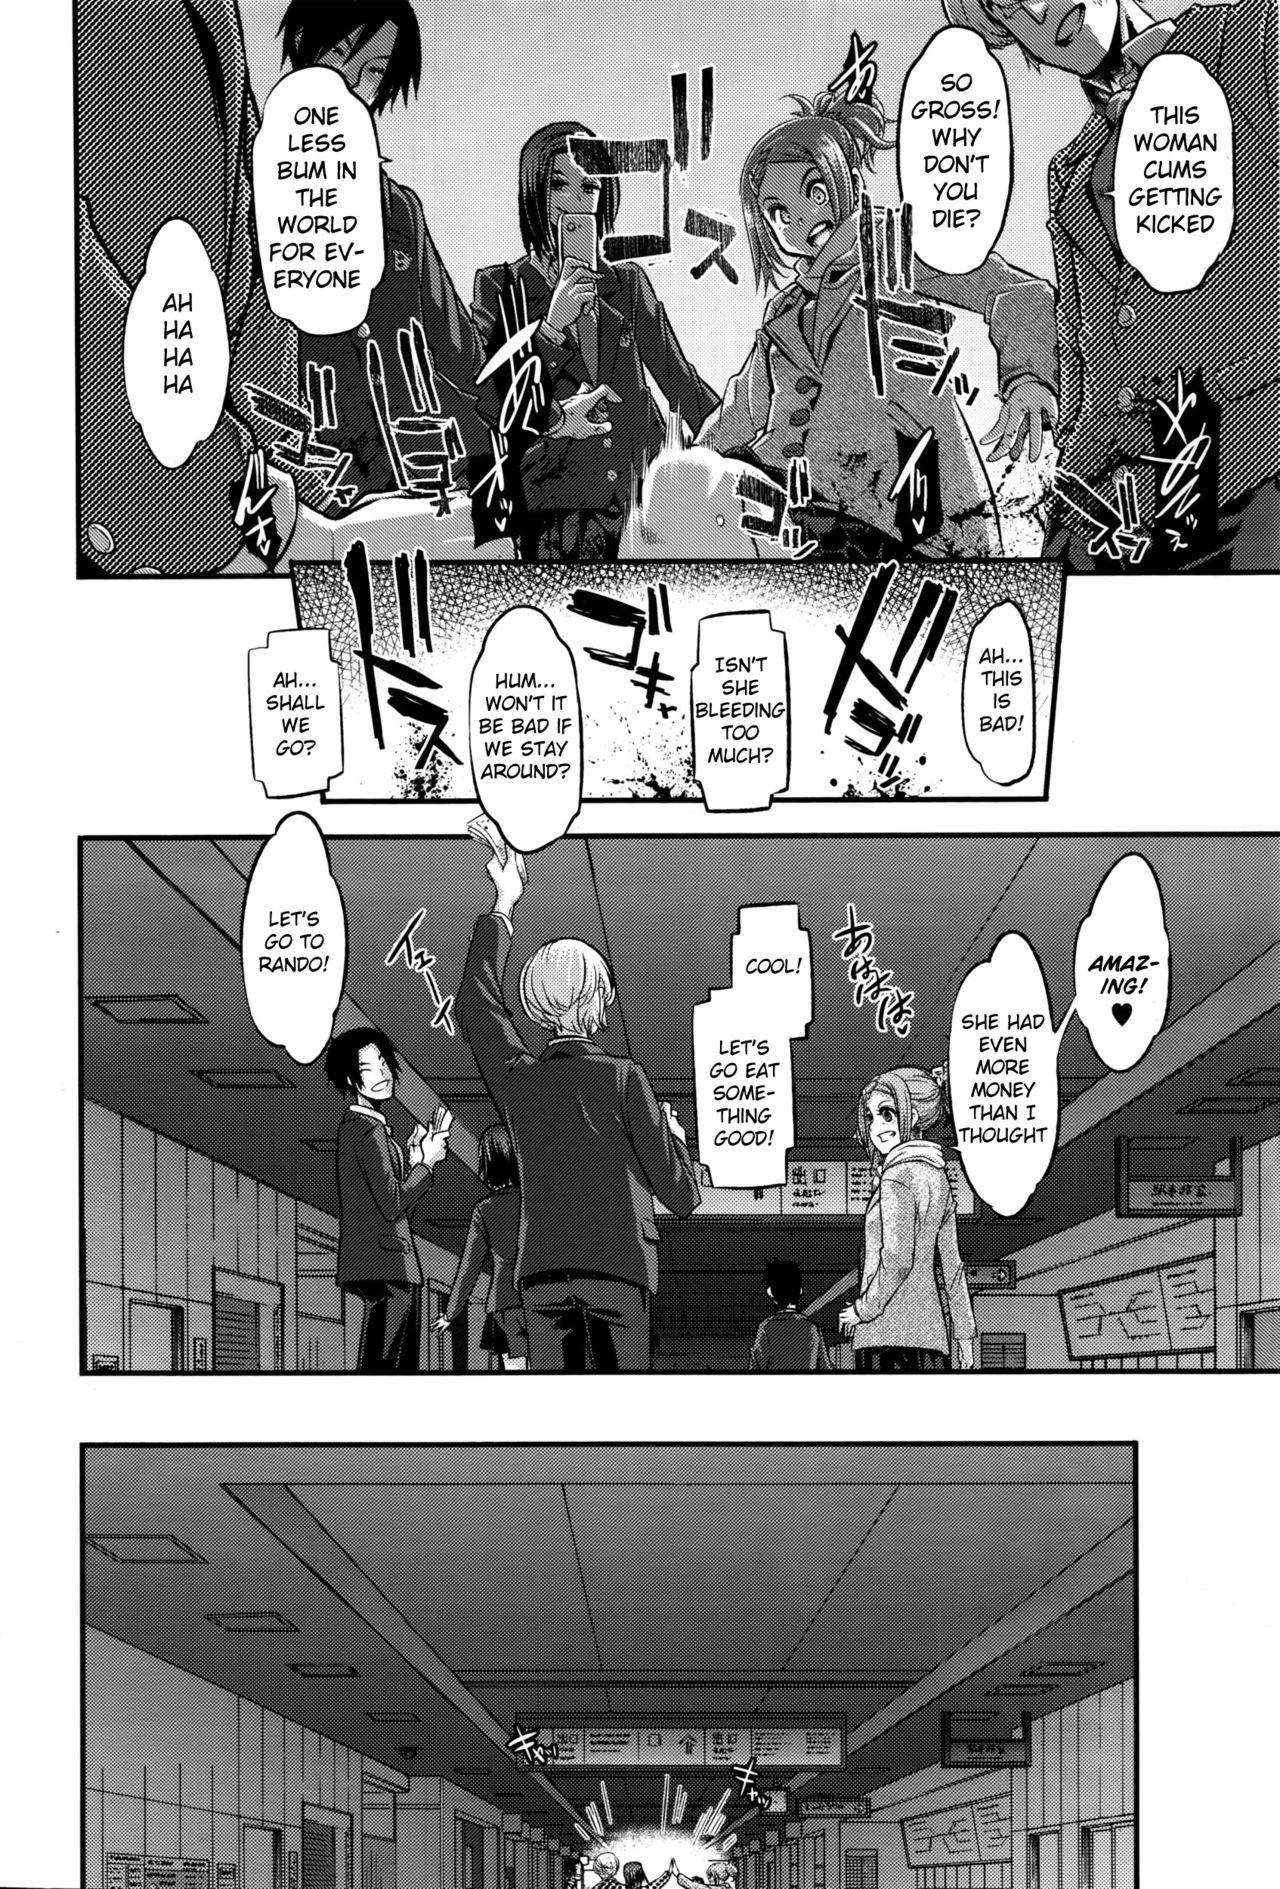 [ShindoL] Henshin -metamorphosis- Ch. 7 (COMIC X-EROS #41) [English] {anon} 27